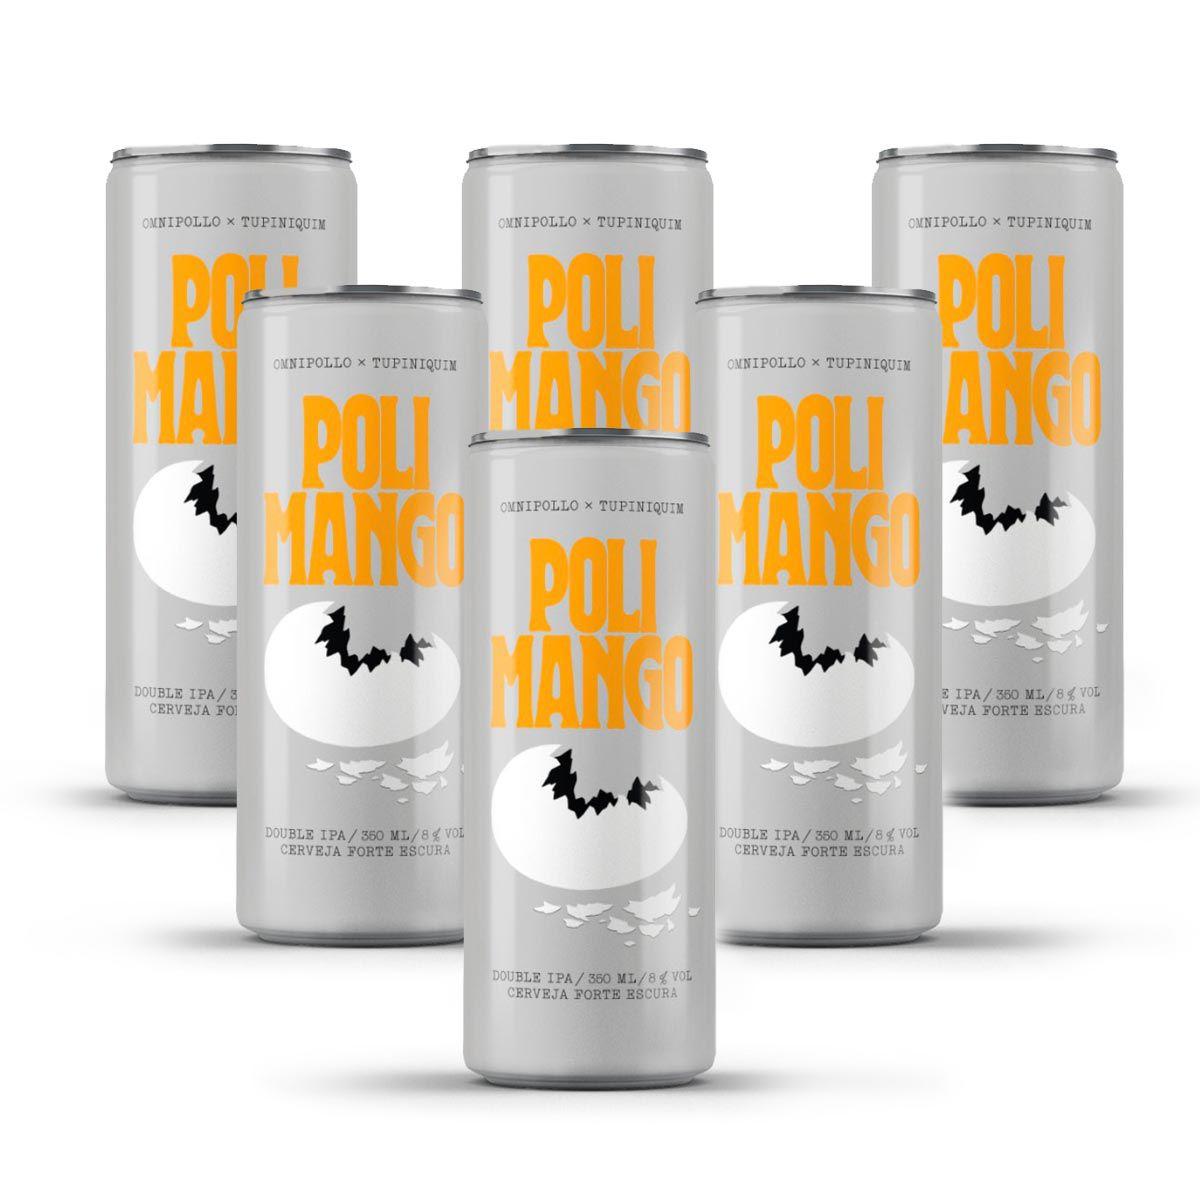 Pack Tupiniquim Polimango Double IPA 6 latas 350ml